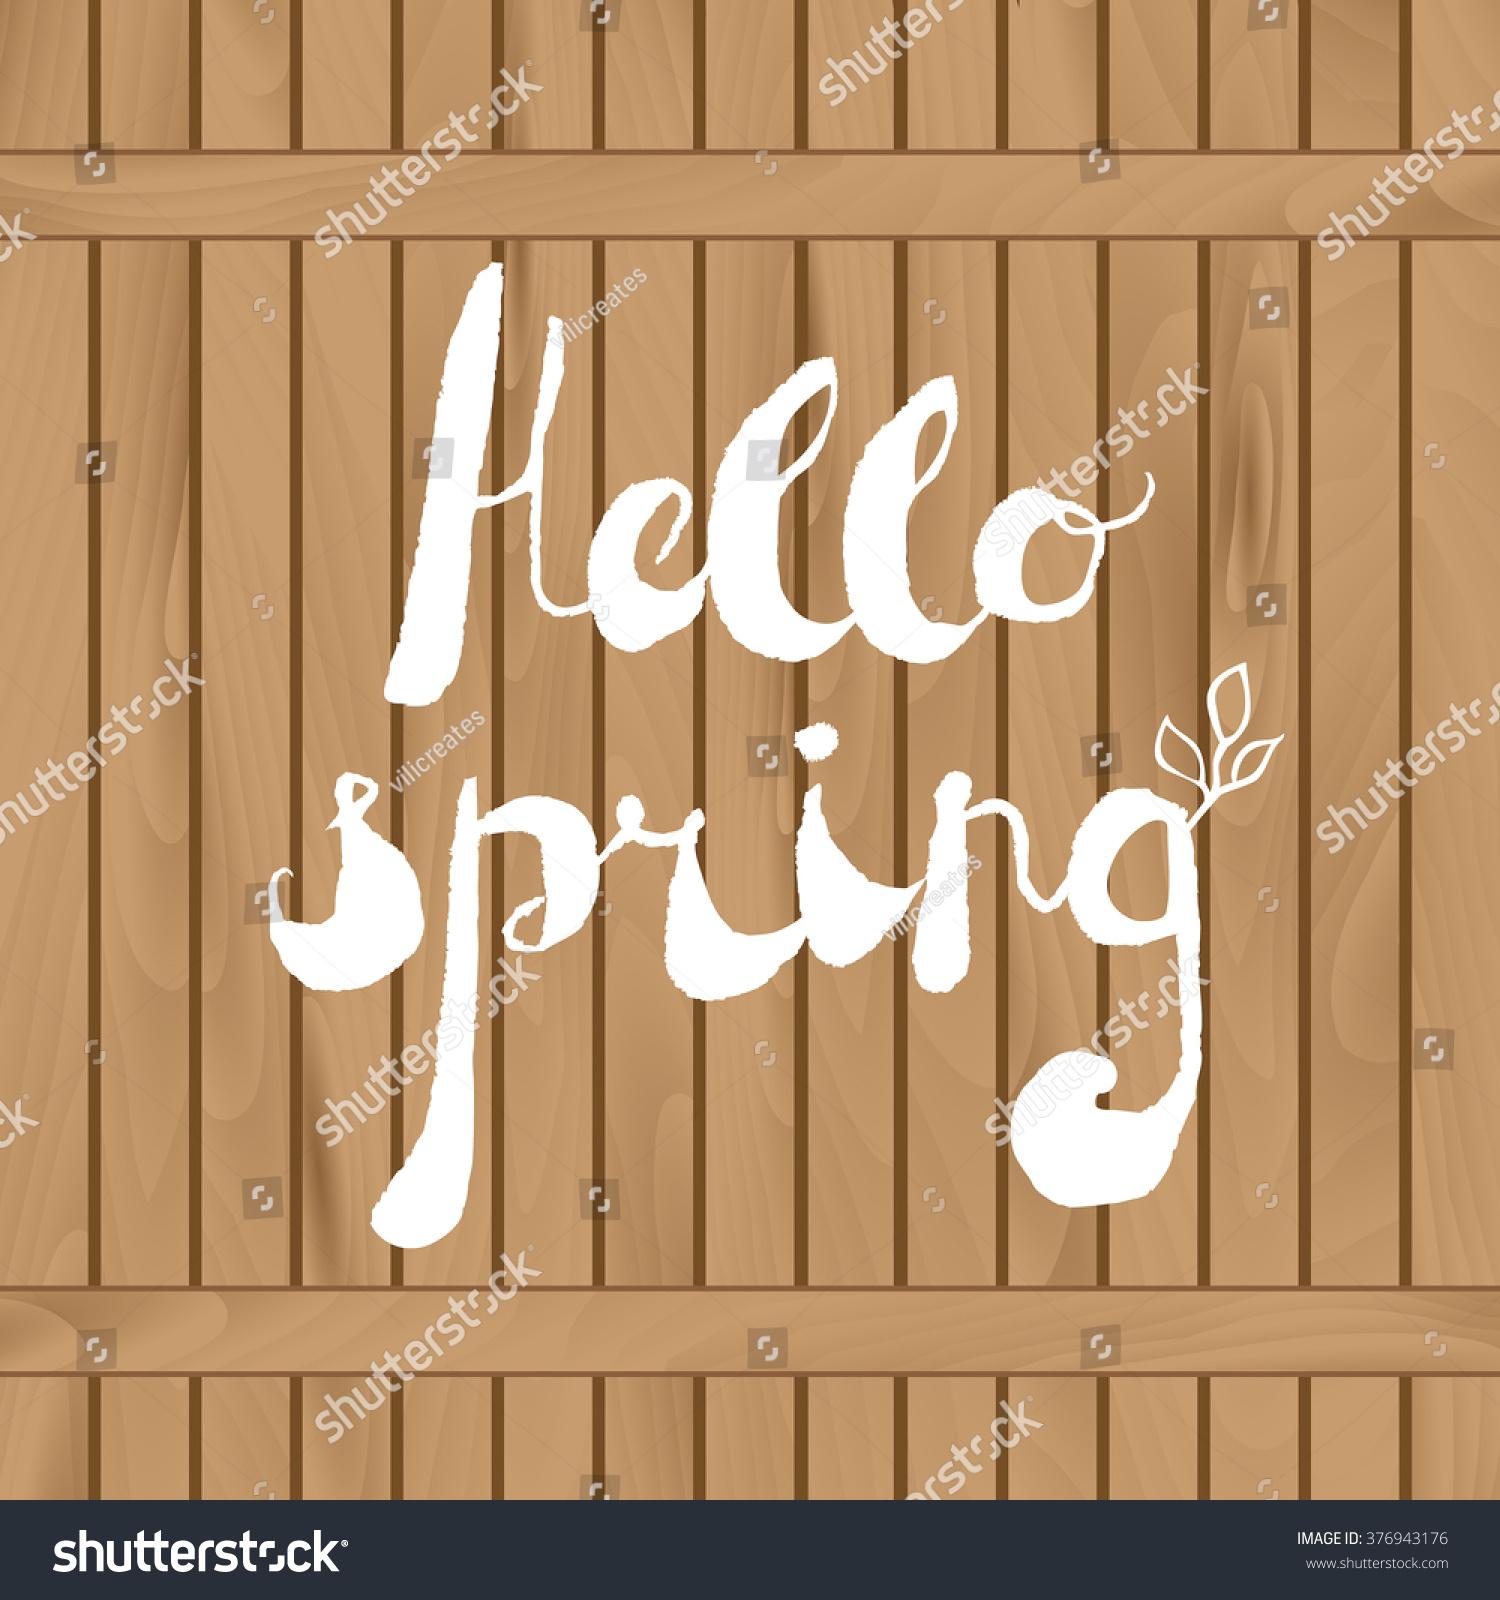 Spring Season Welcoming Season Greetings Handwritten Stock Vector